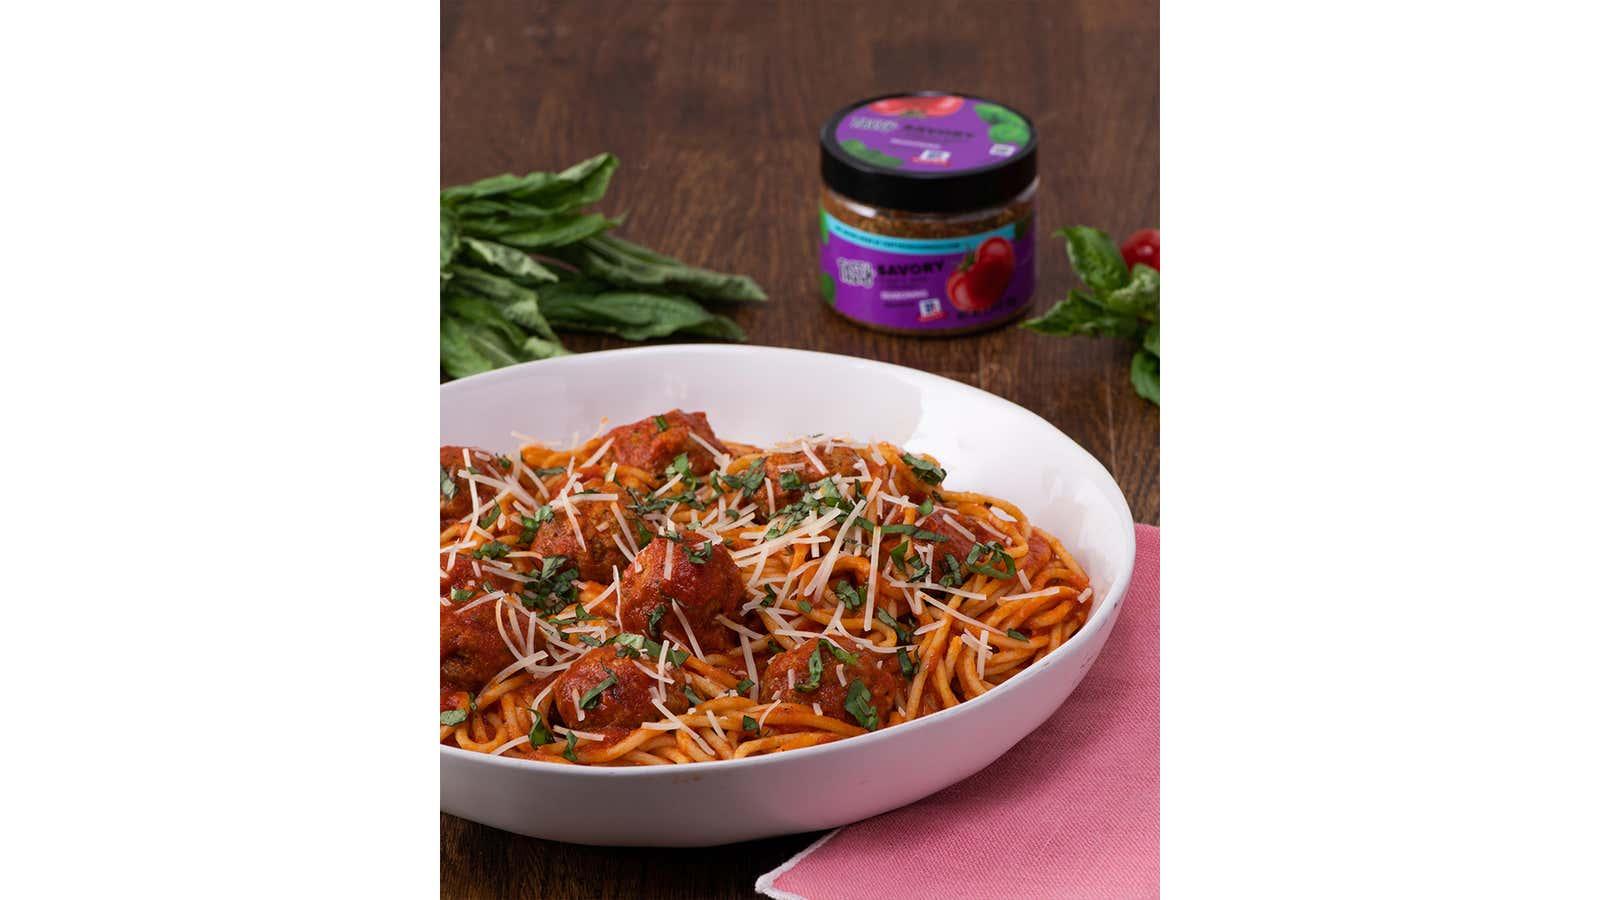 Savoury Spaghetti With Meatballs